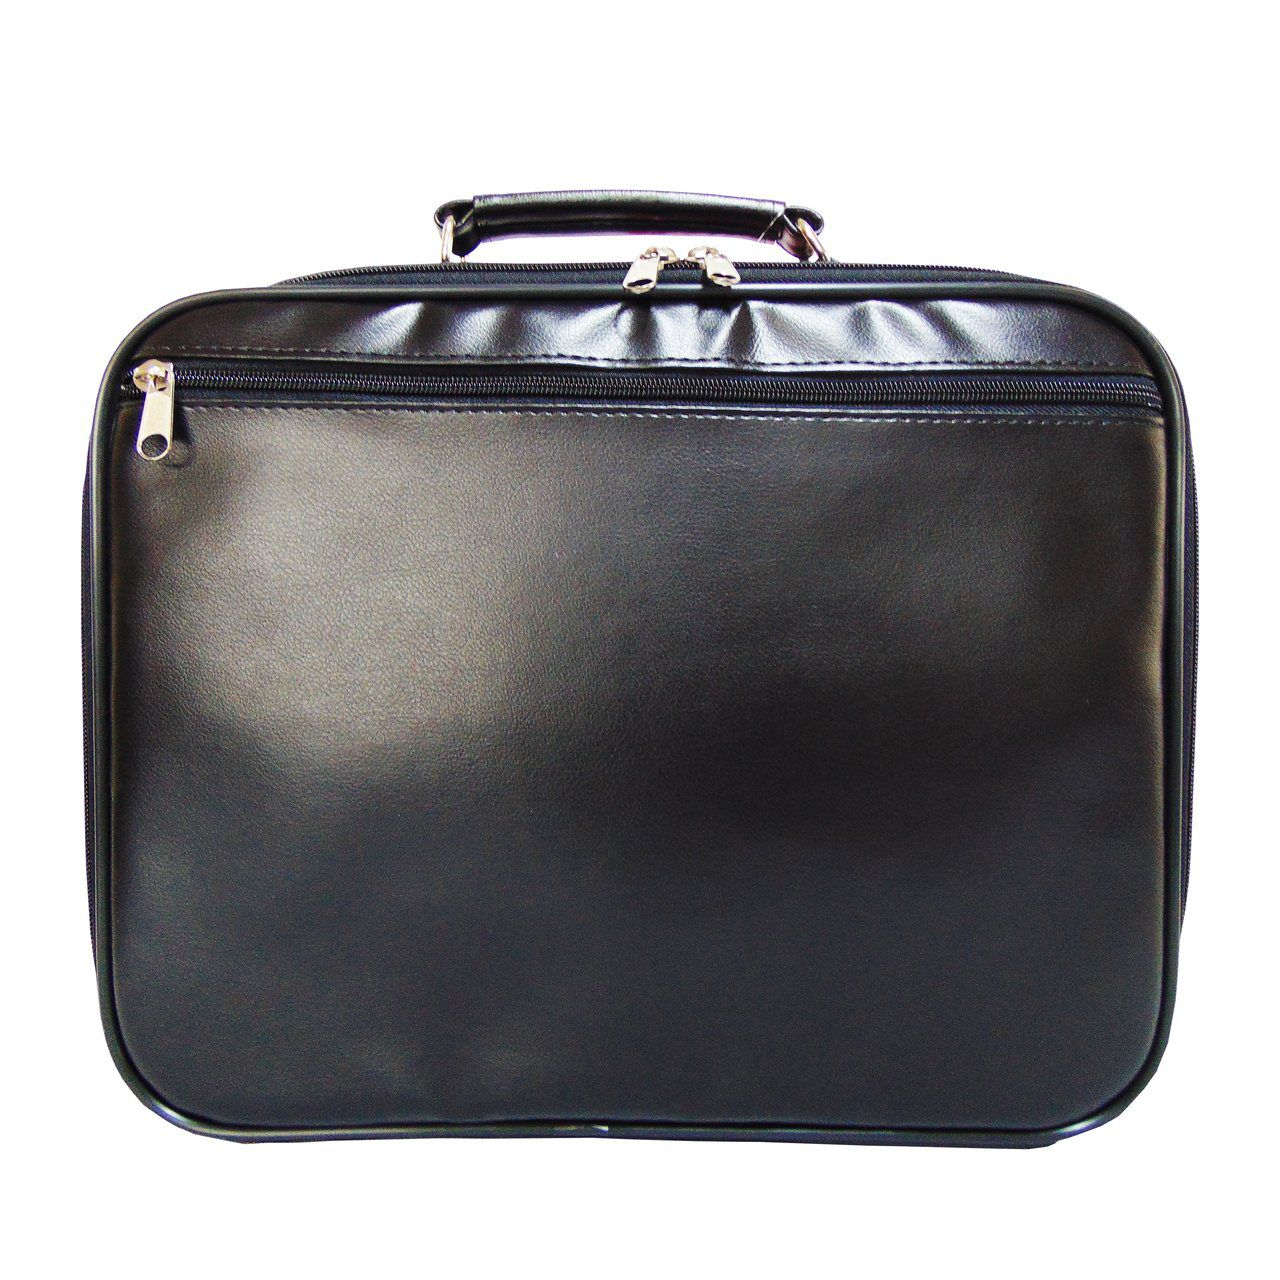 Maleta Notebook Soft - Preta